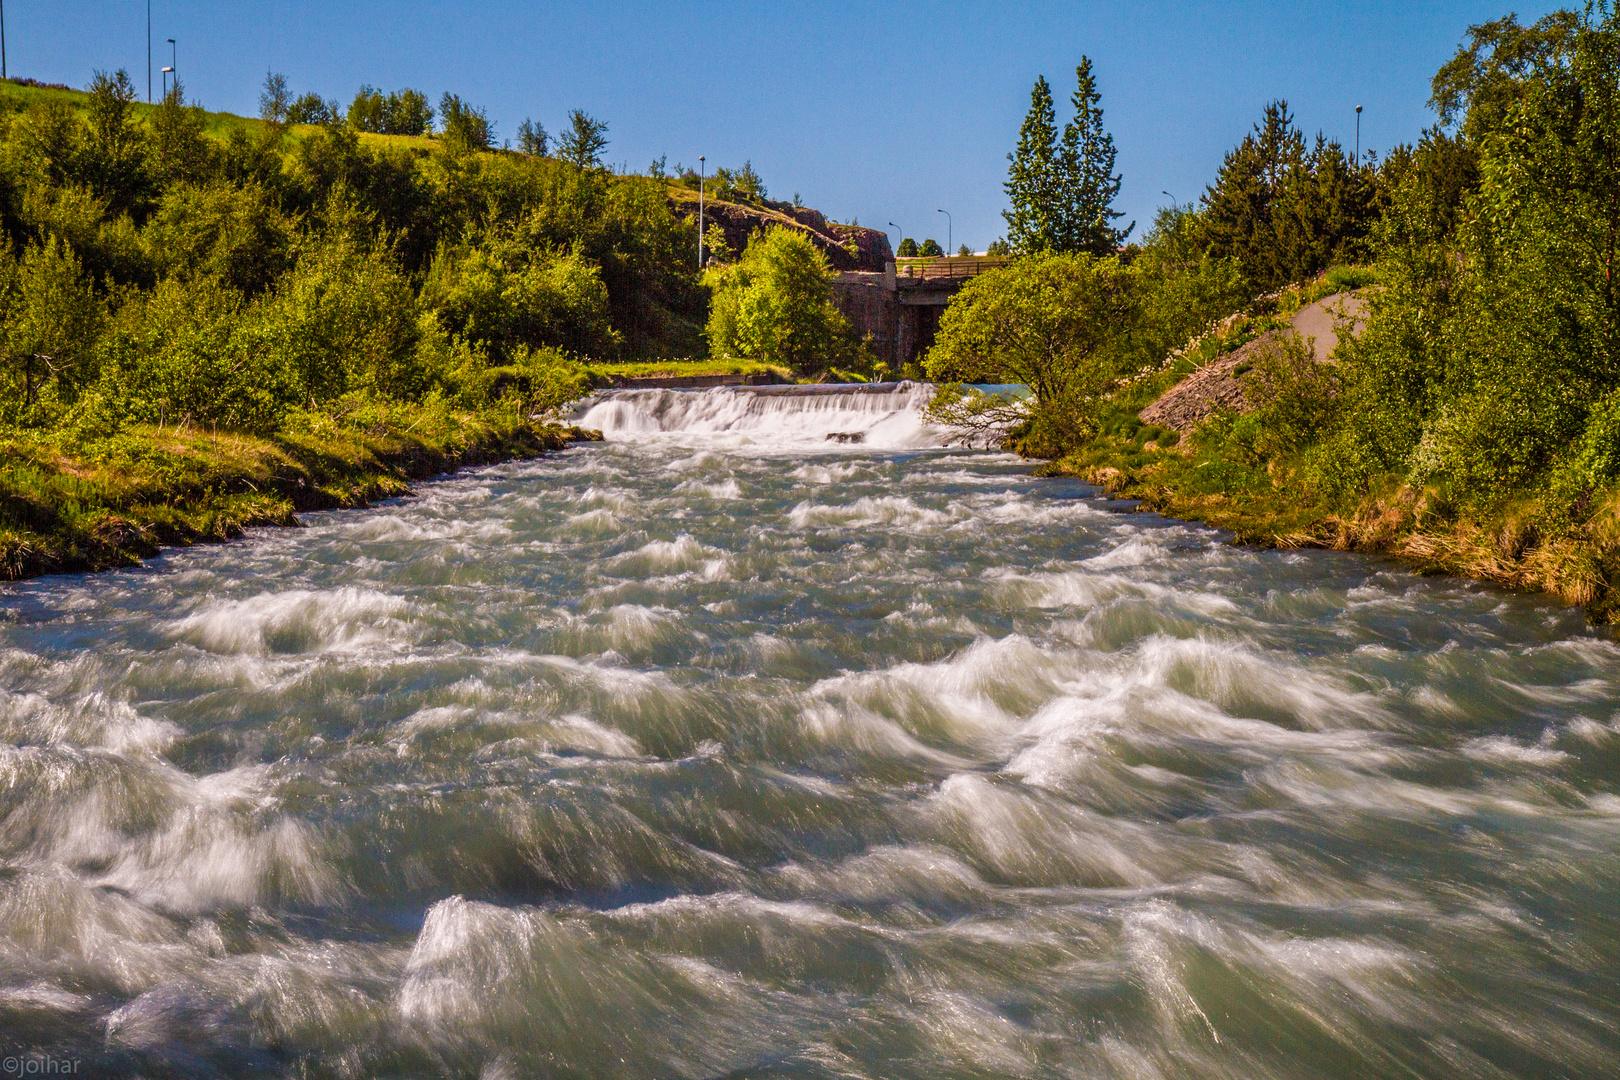 Glerá river